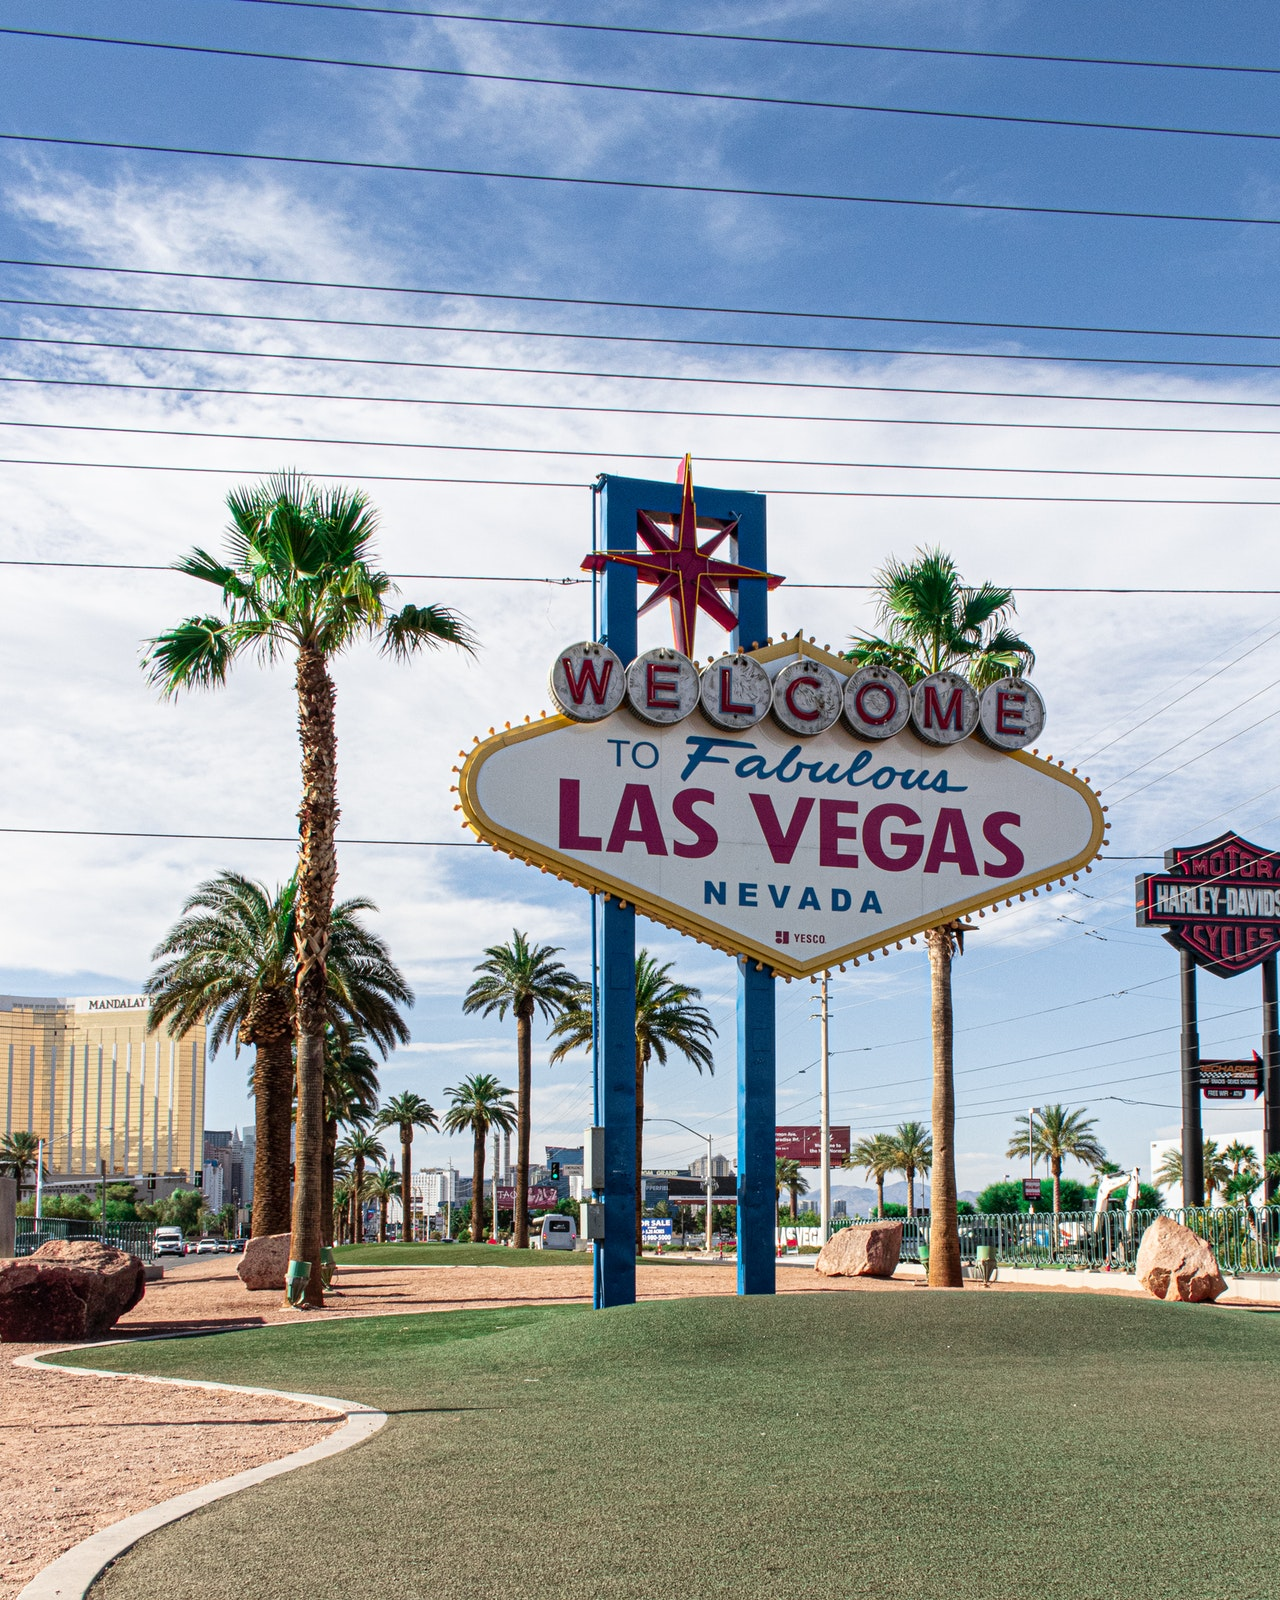 8 Experiences Vegas Header Image